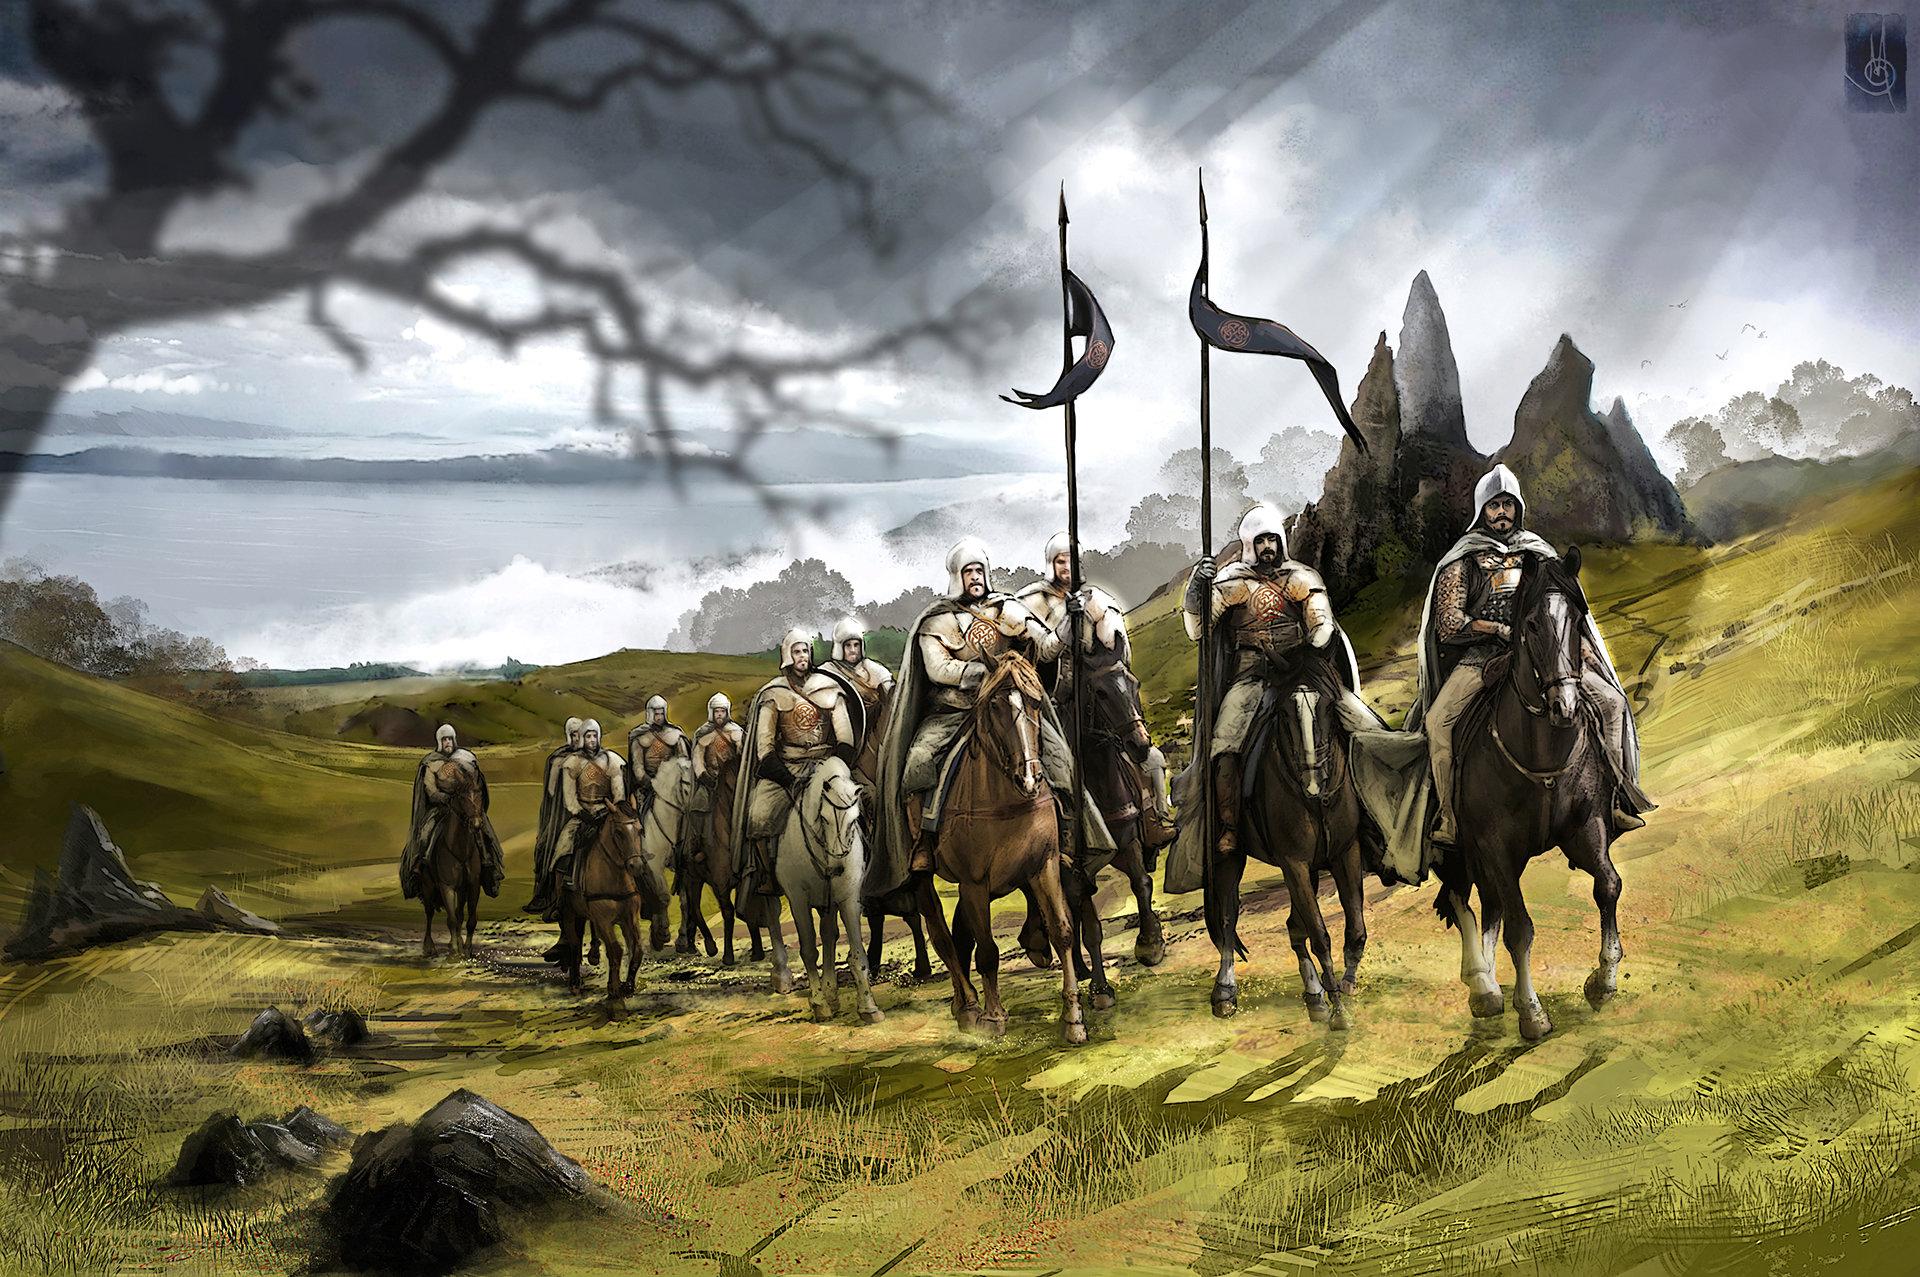 Murat gul army by muratgul